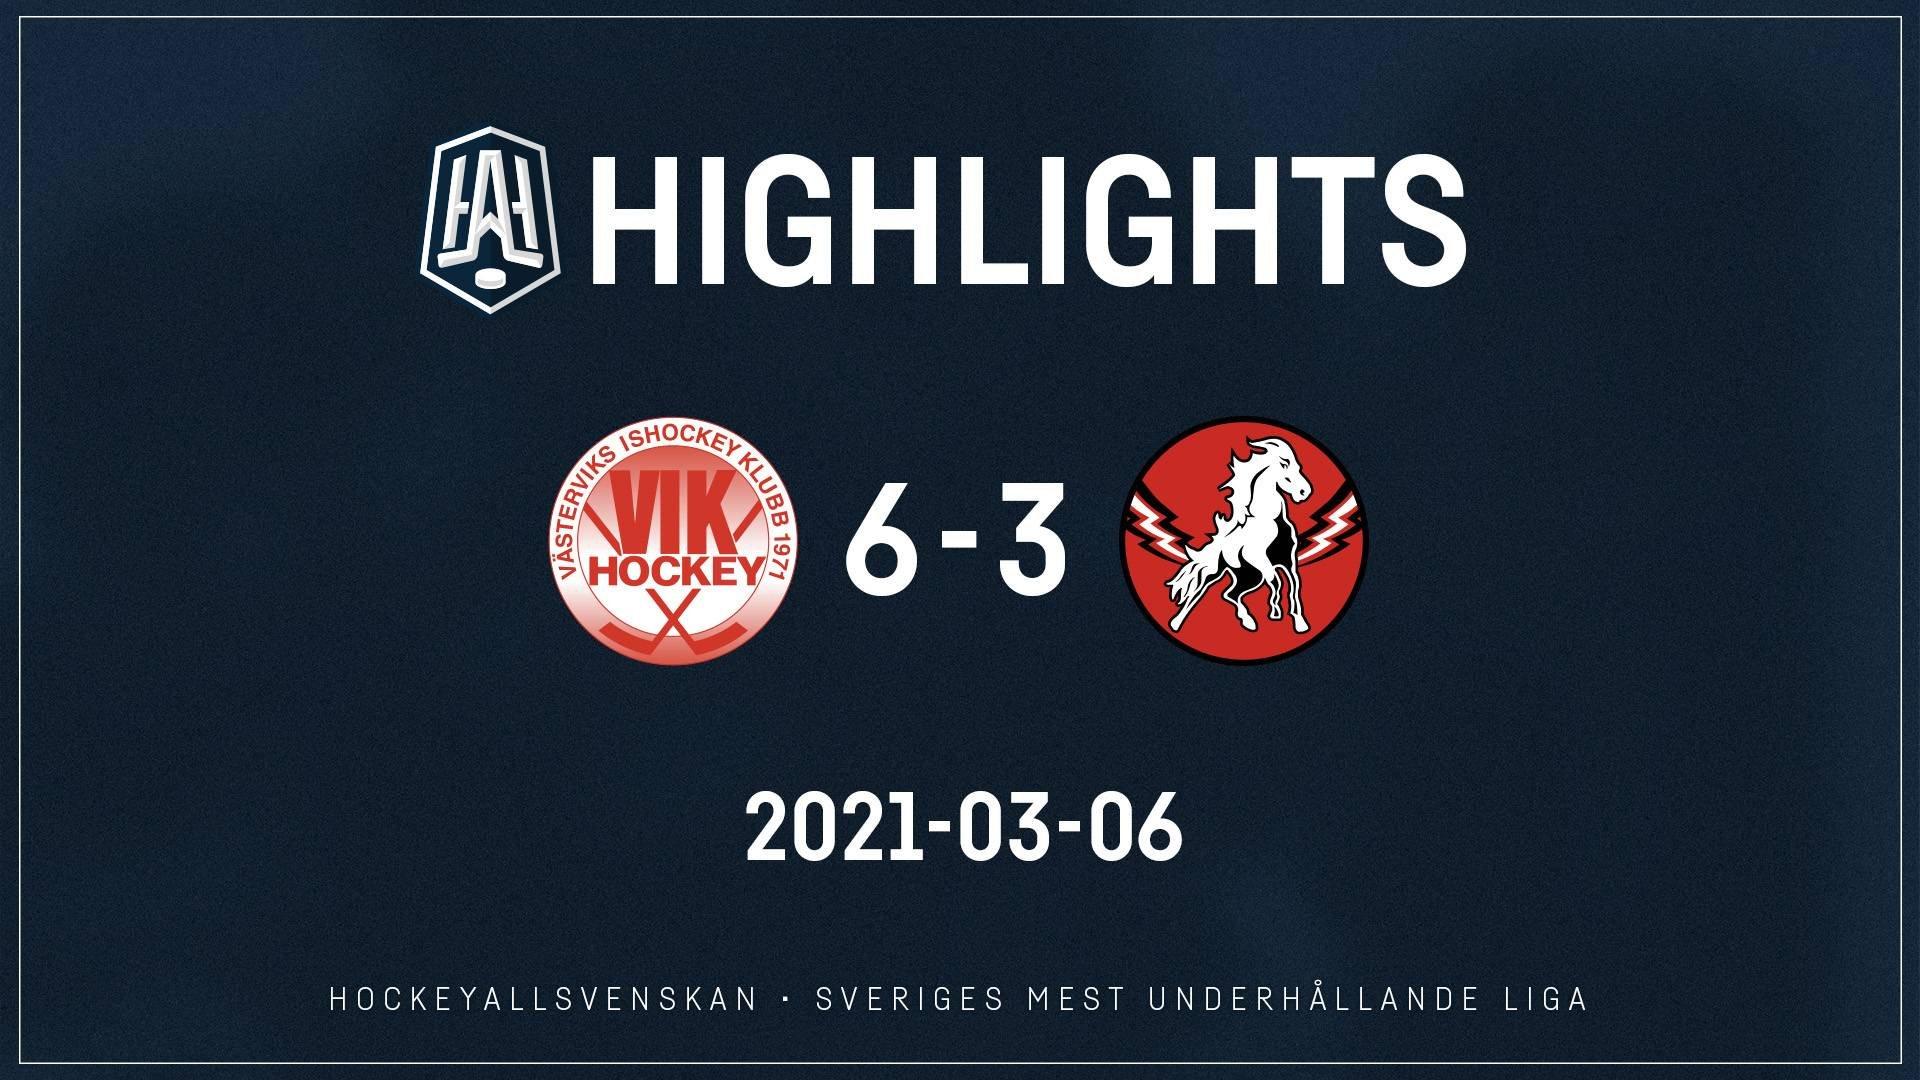 2021-03-06 Västervik - Vita Hästen 6-3